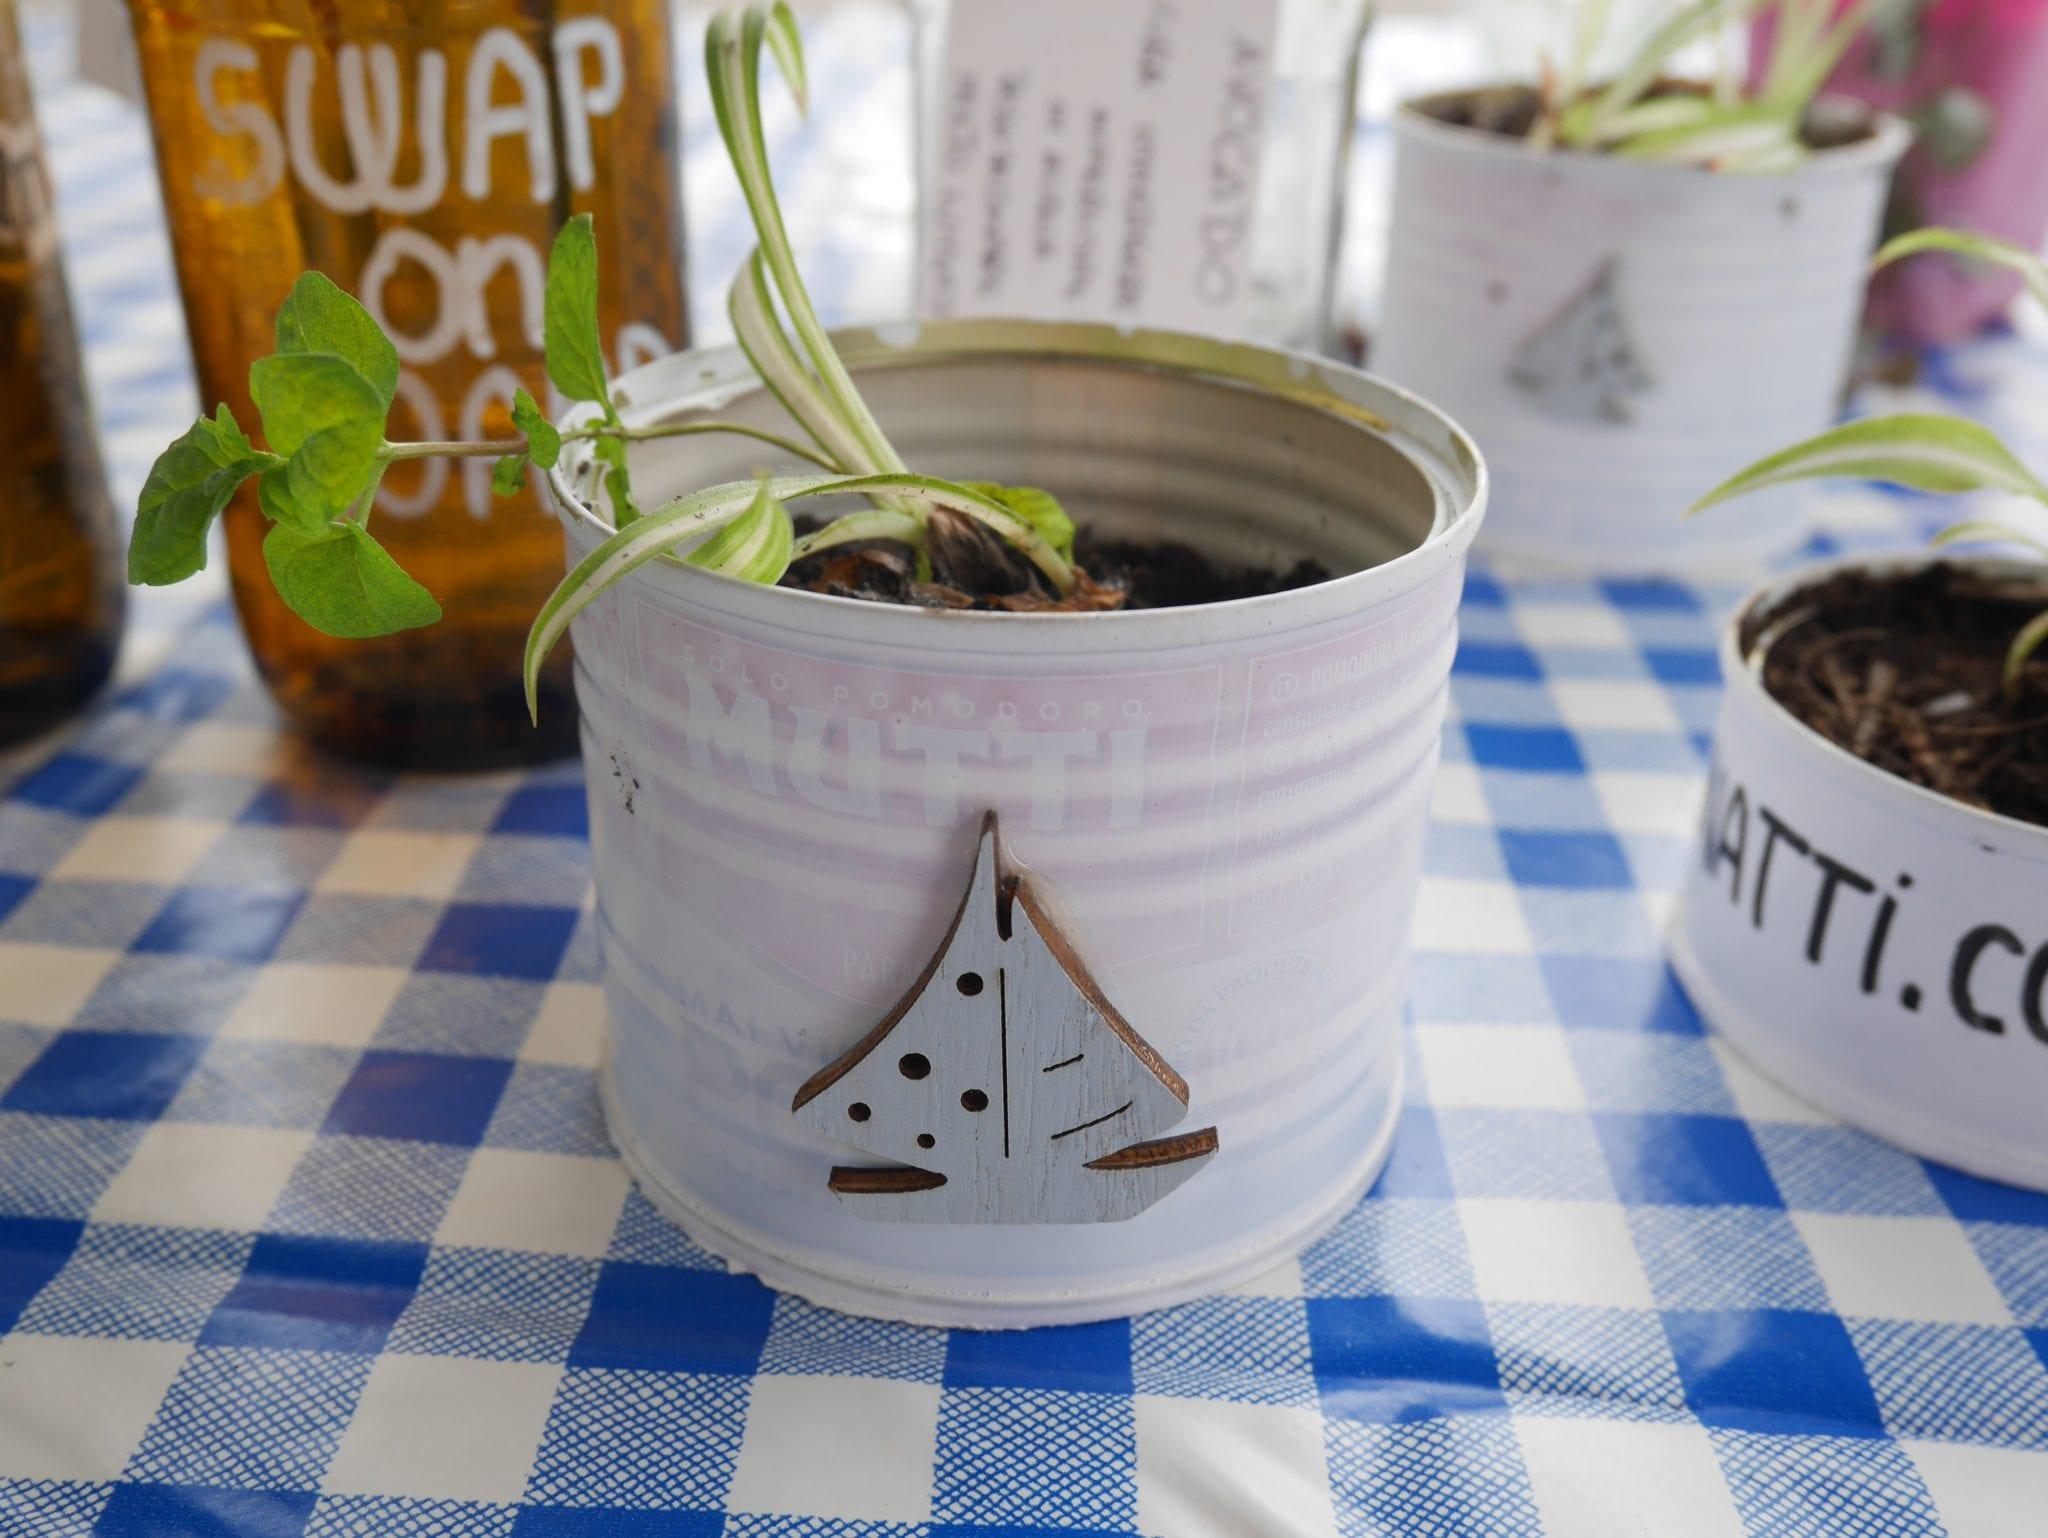 Latta Plant swap on board - Le Plume